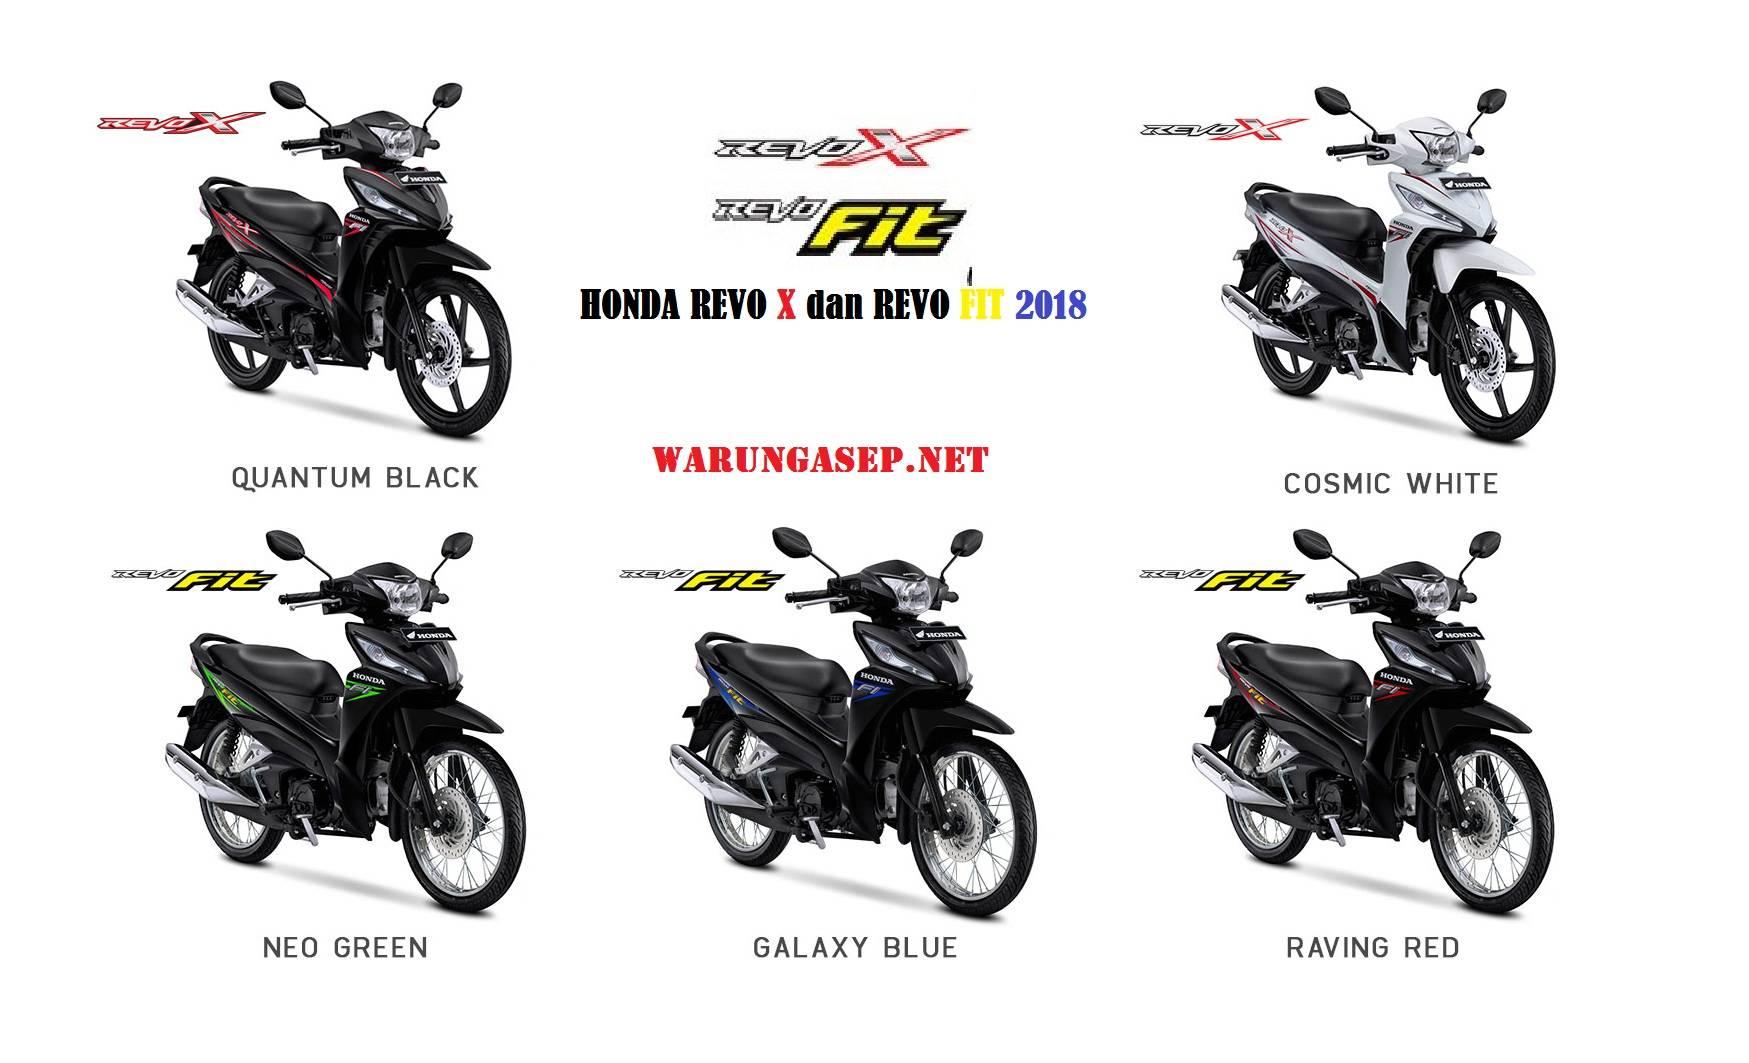 Foto 5 Warna Baru Honda Revo X Dan Revo Fit 2018 Warungasep